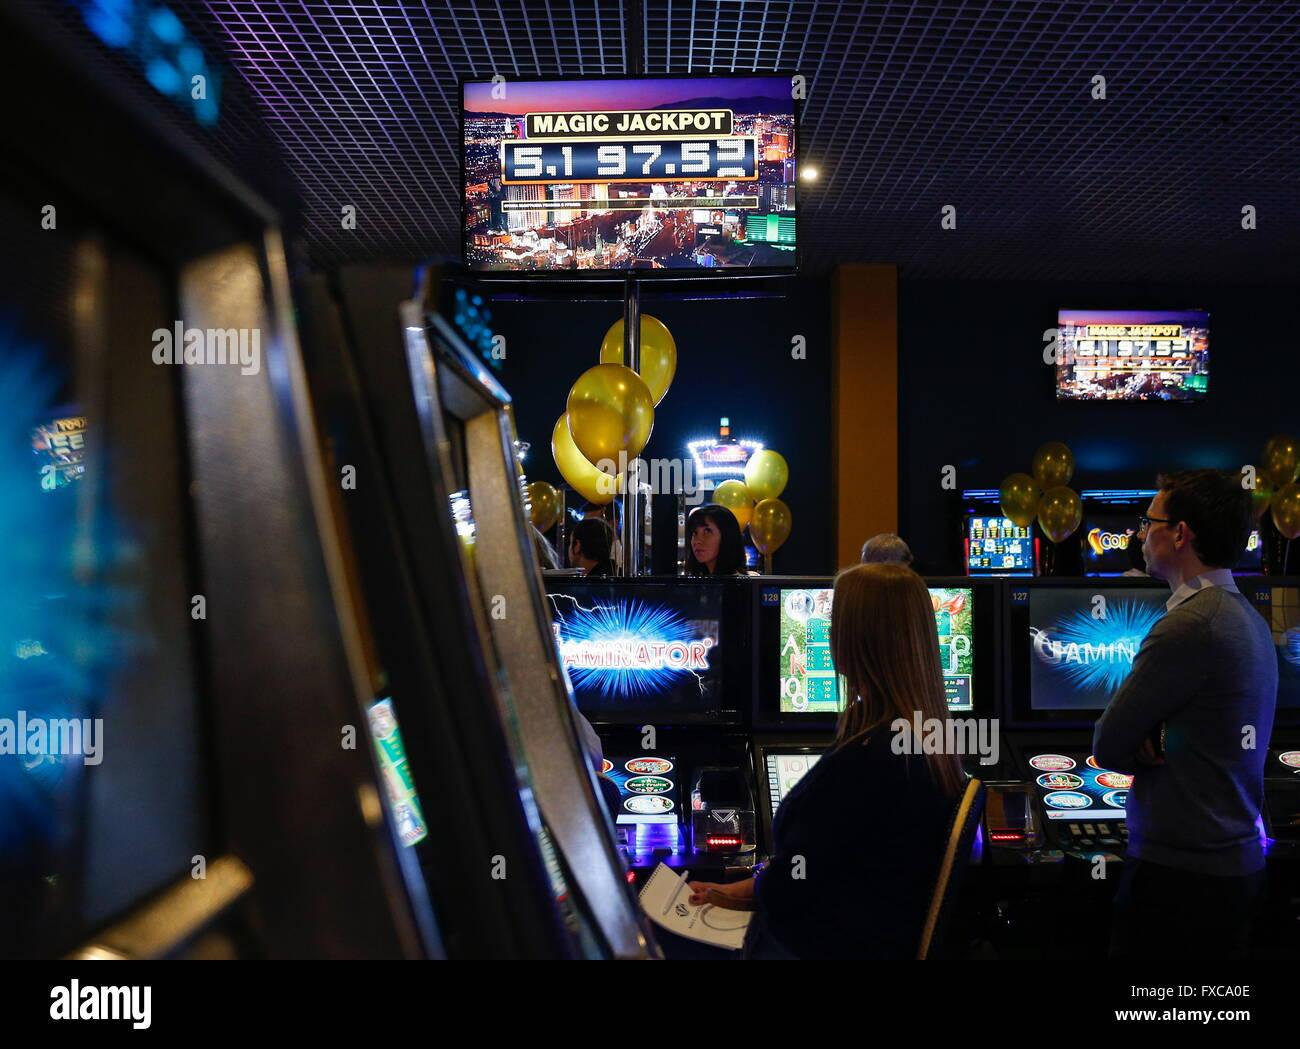 casino in kulikovo Kaliningrad regio foto beoordeling